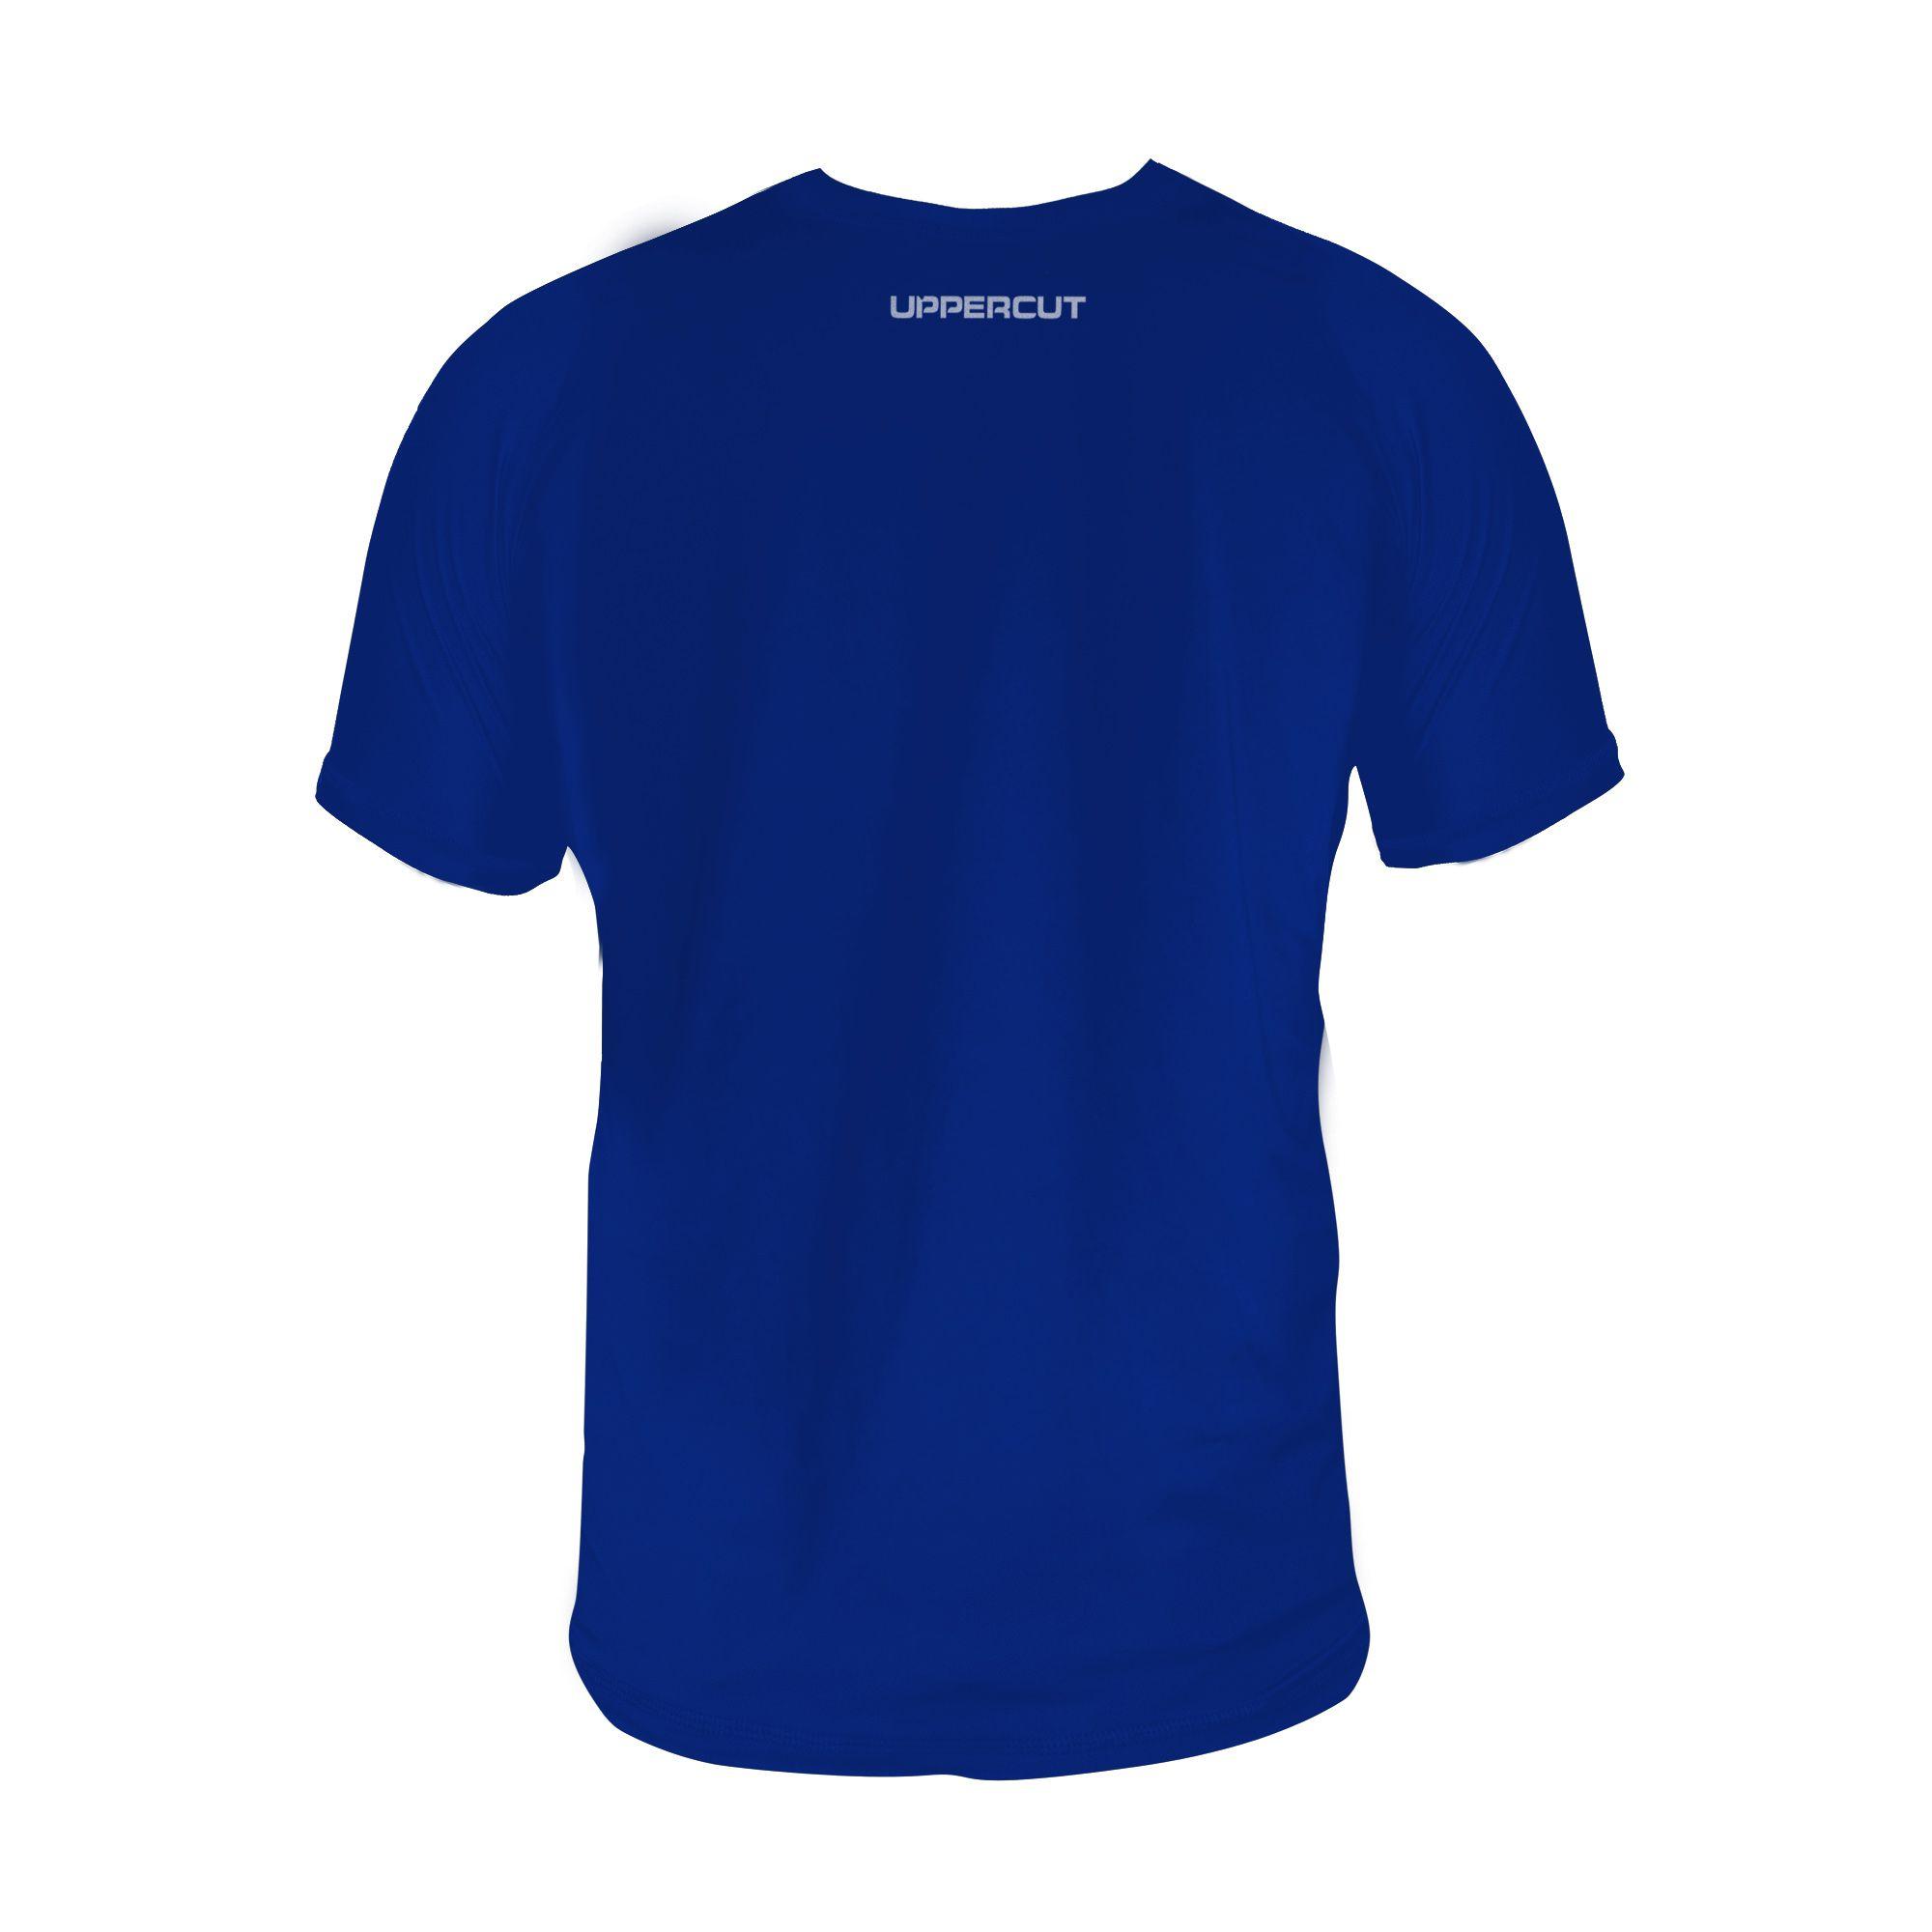 Camiseta Jiu-Jitsu Leg Lock Uppercut Dry U.V